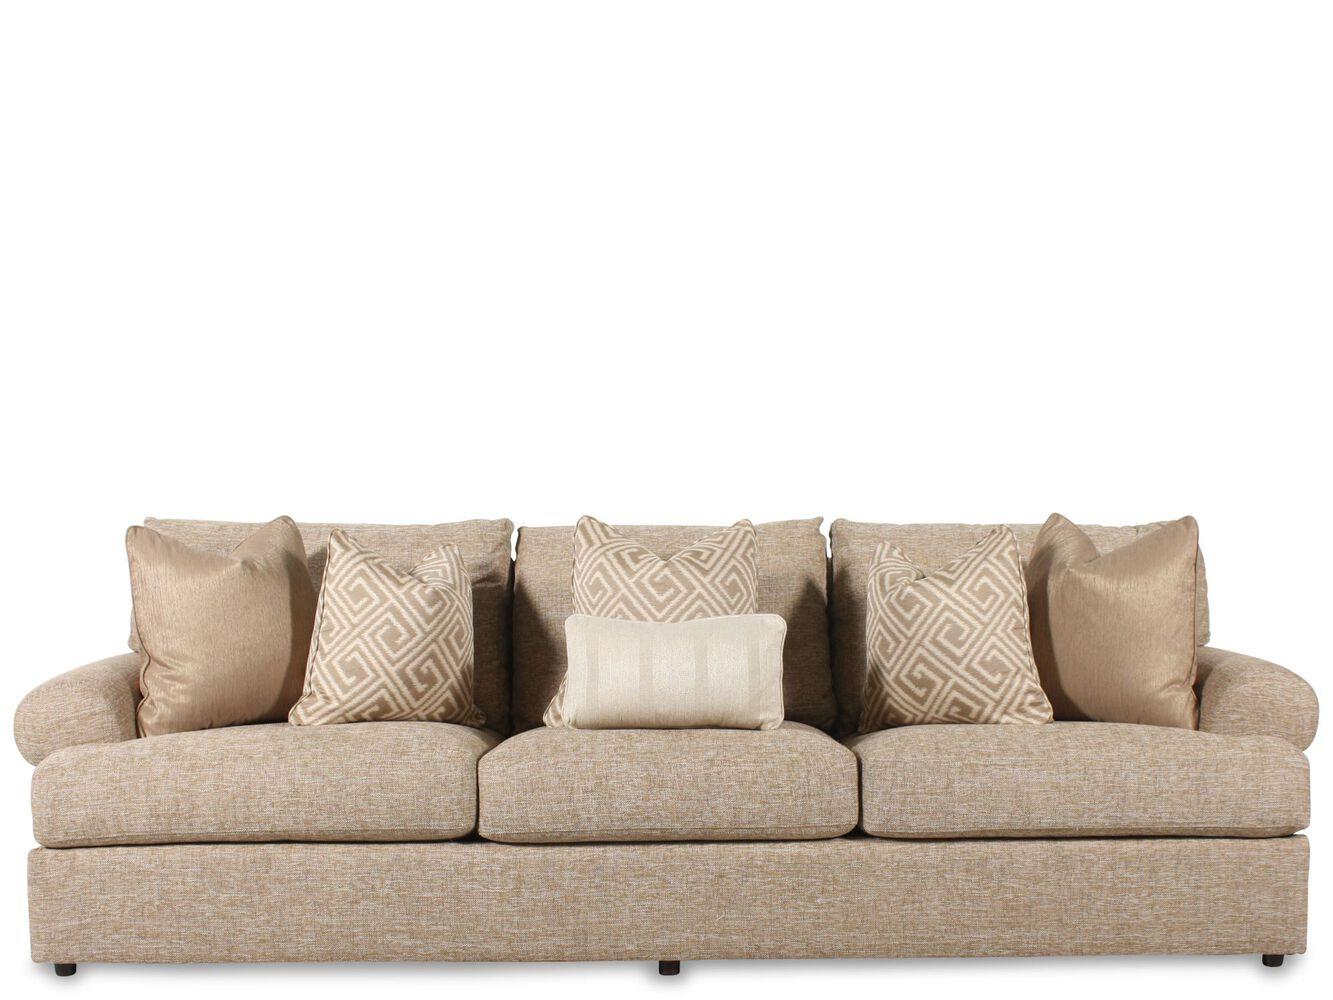 Contemporary 117 Sofa In Light Brown